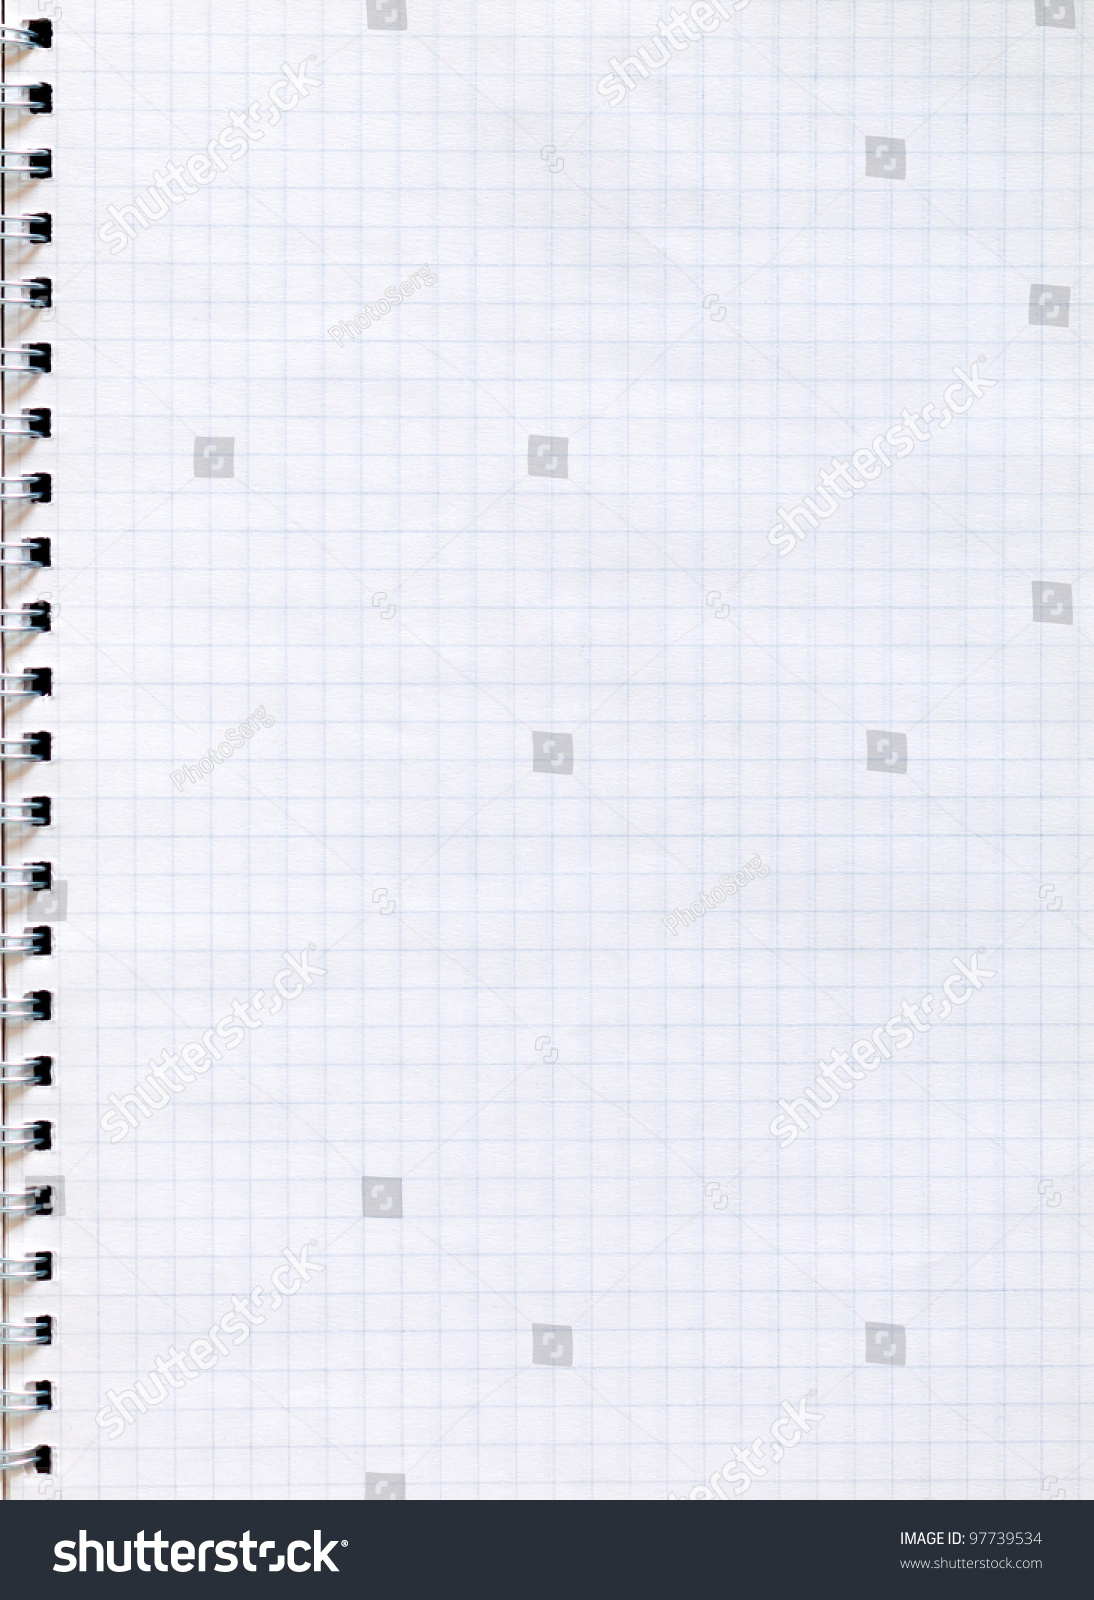 spiral notepad graph paper stock photo 97739534   shutterstock